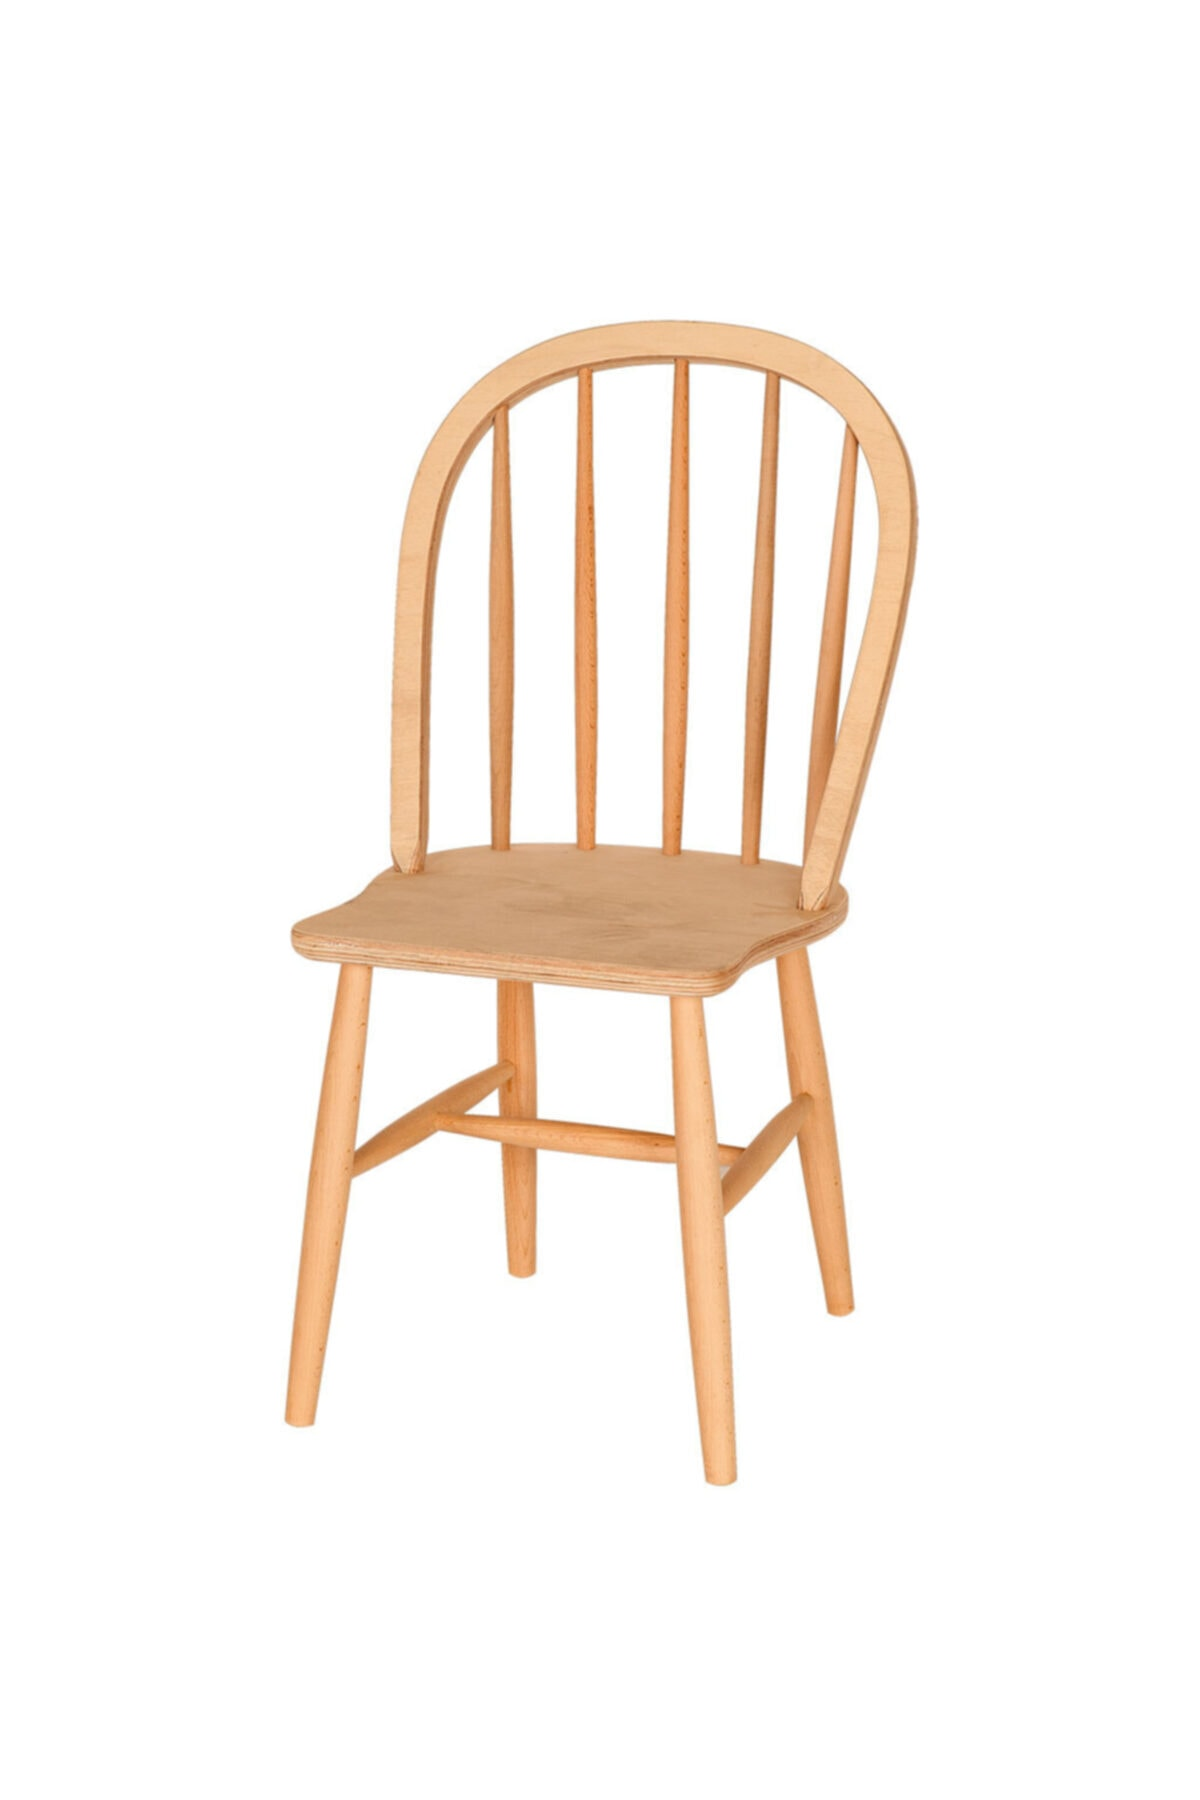 Amerikan Sandalye Ham Cilasız Ahşap